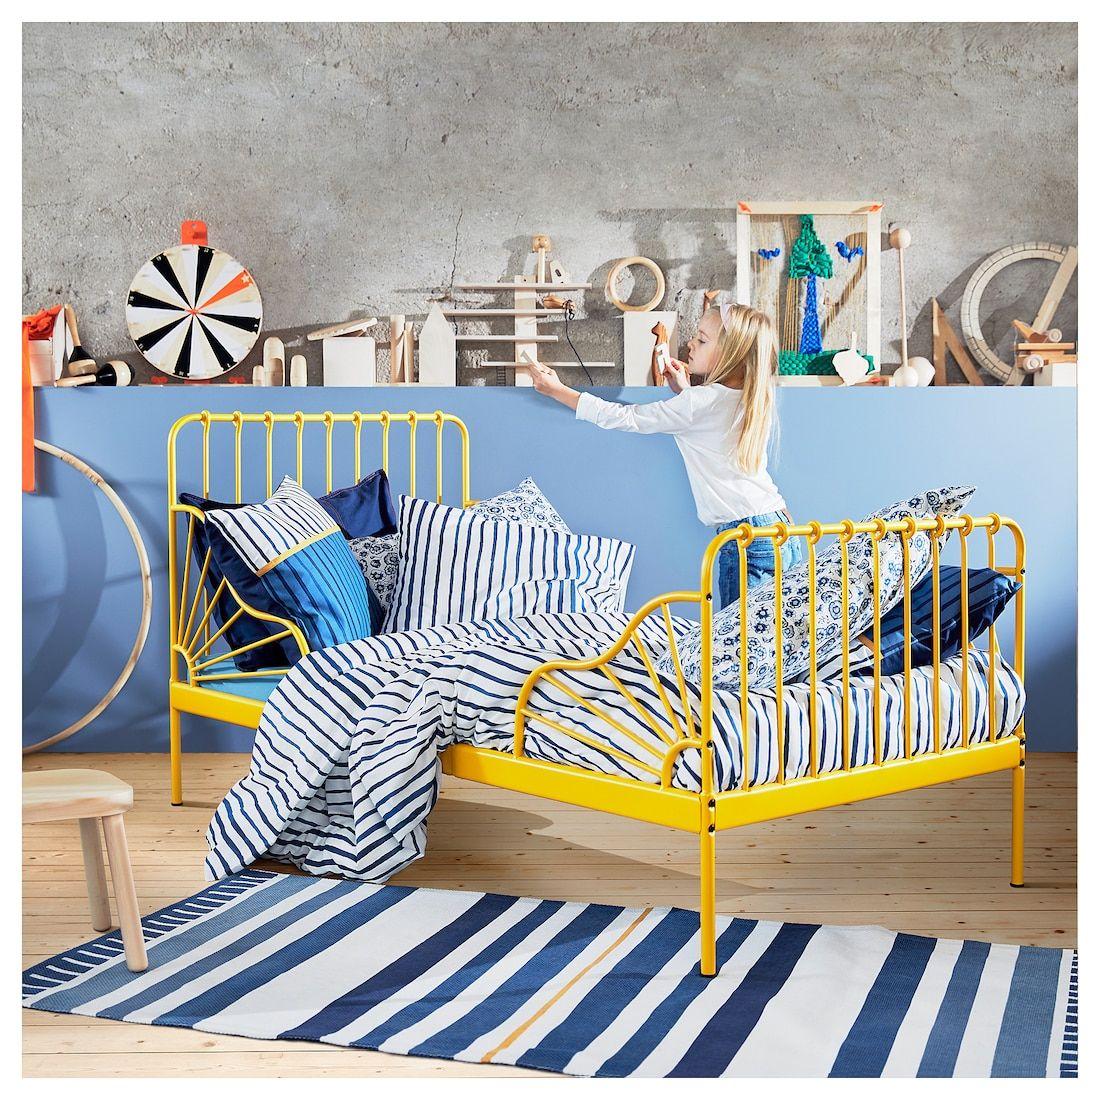 Mobler Inredning Och Inspiration Mobelideer Ikea Och Sangramar